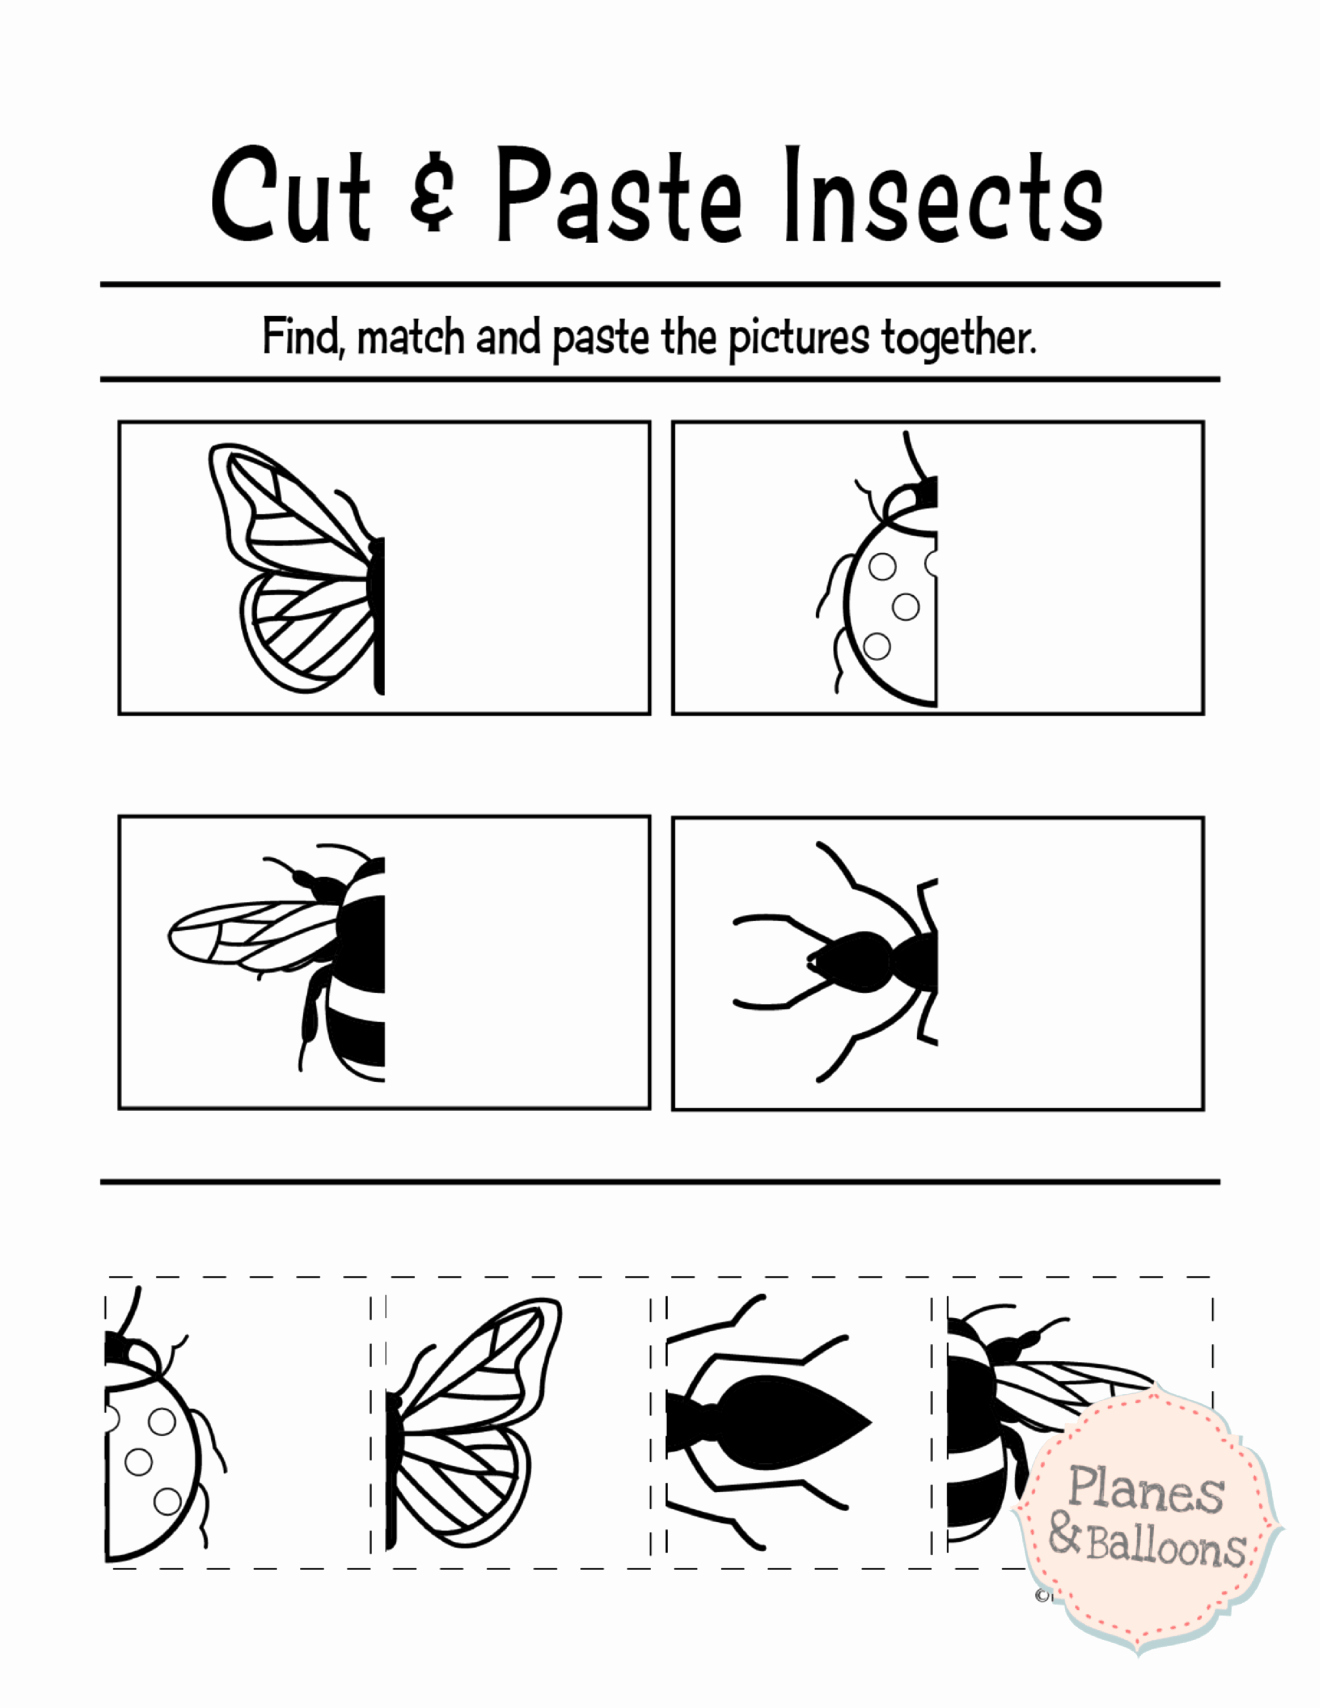 Cut and Paste Worksheets Free Elegant Free Printable Cut and Paste Worksheets for Preschool